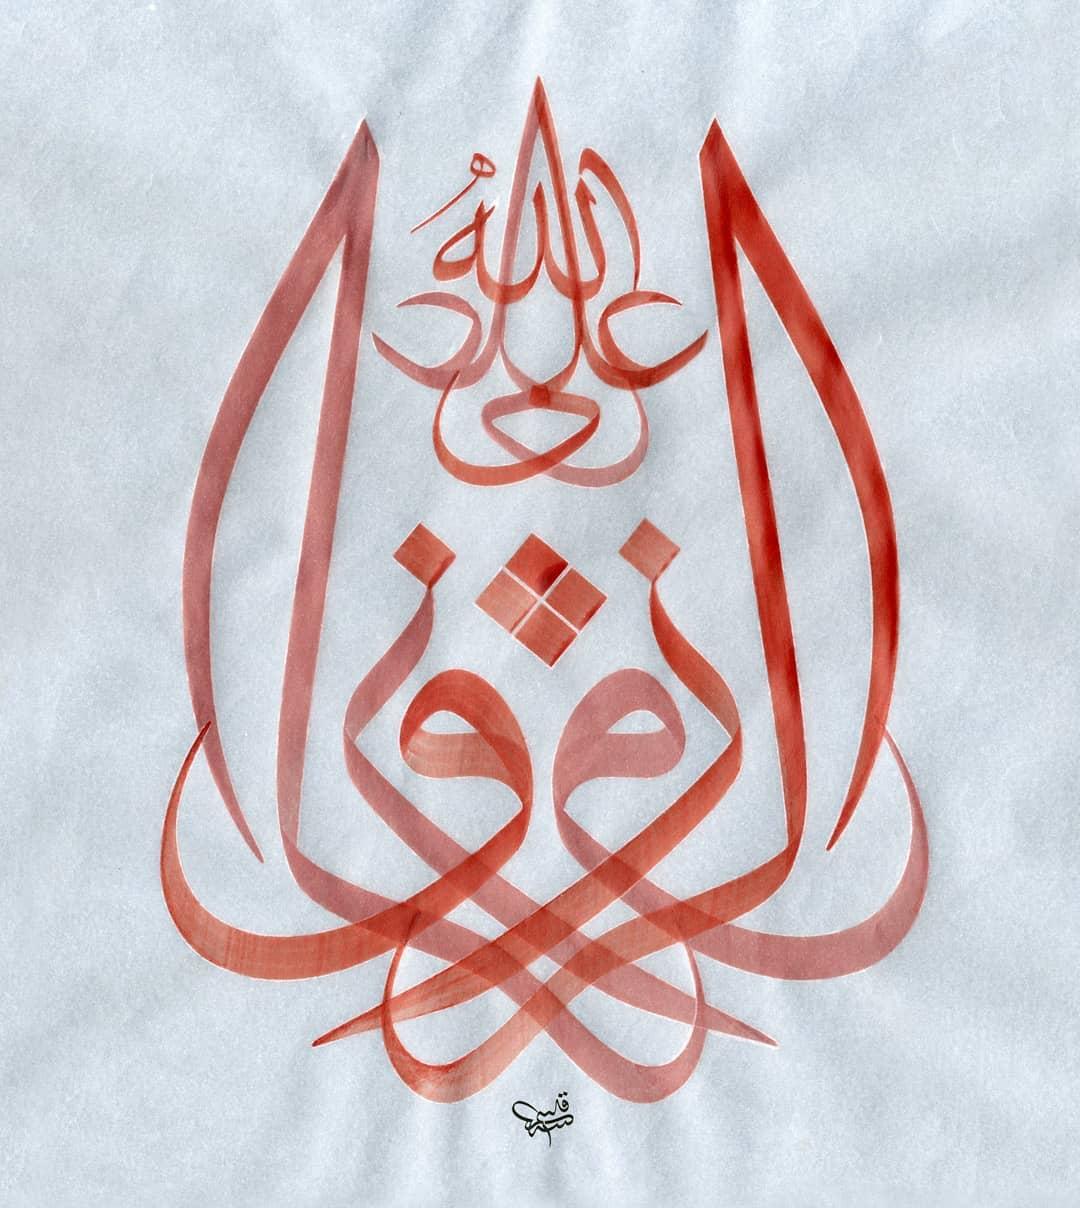 Hattat Kasım Kara قاسم قاره  Kalıp çalışması...1442...#islamicart #sanat #hattat #hatsanatı #kasımkara #tezhi... 245 1